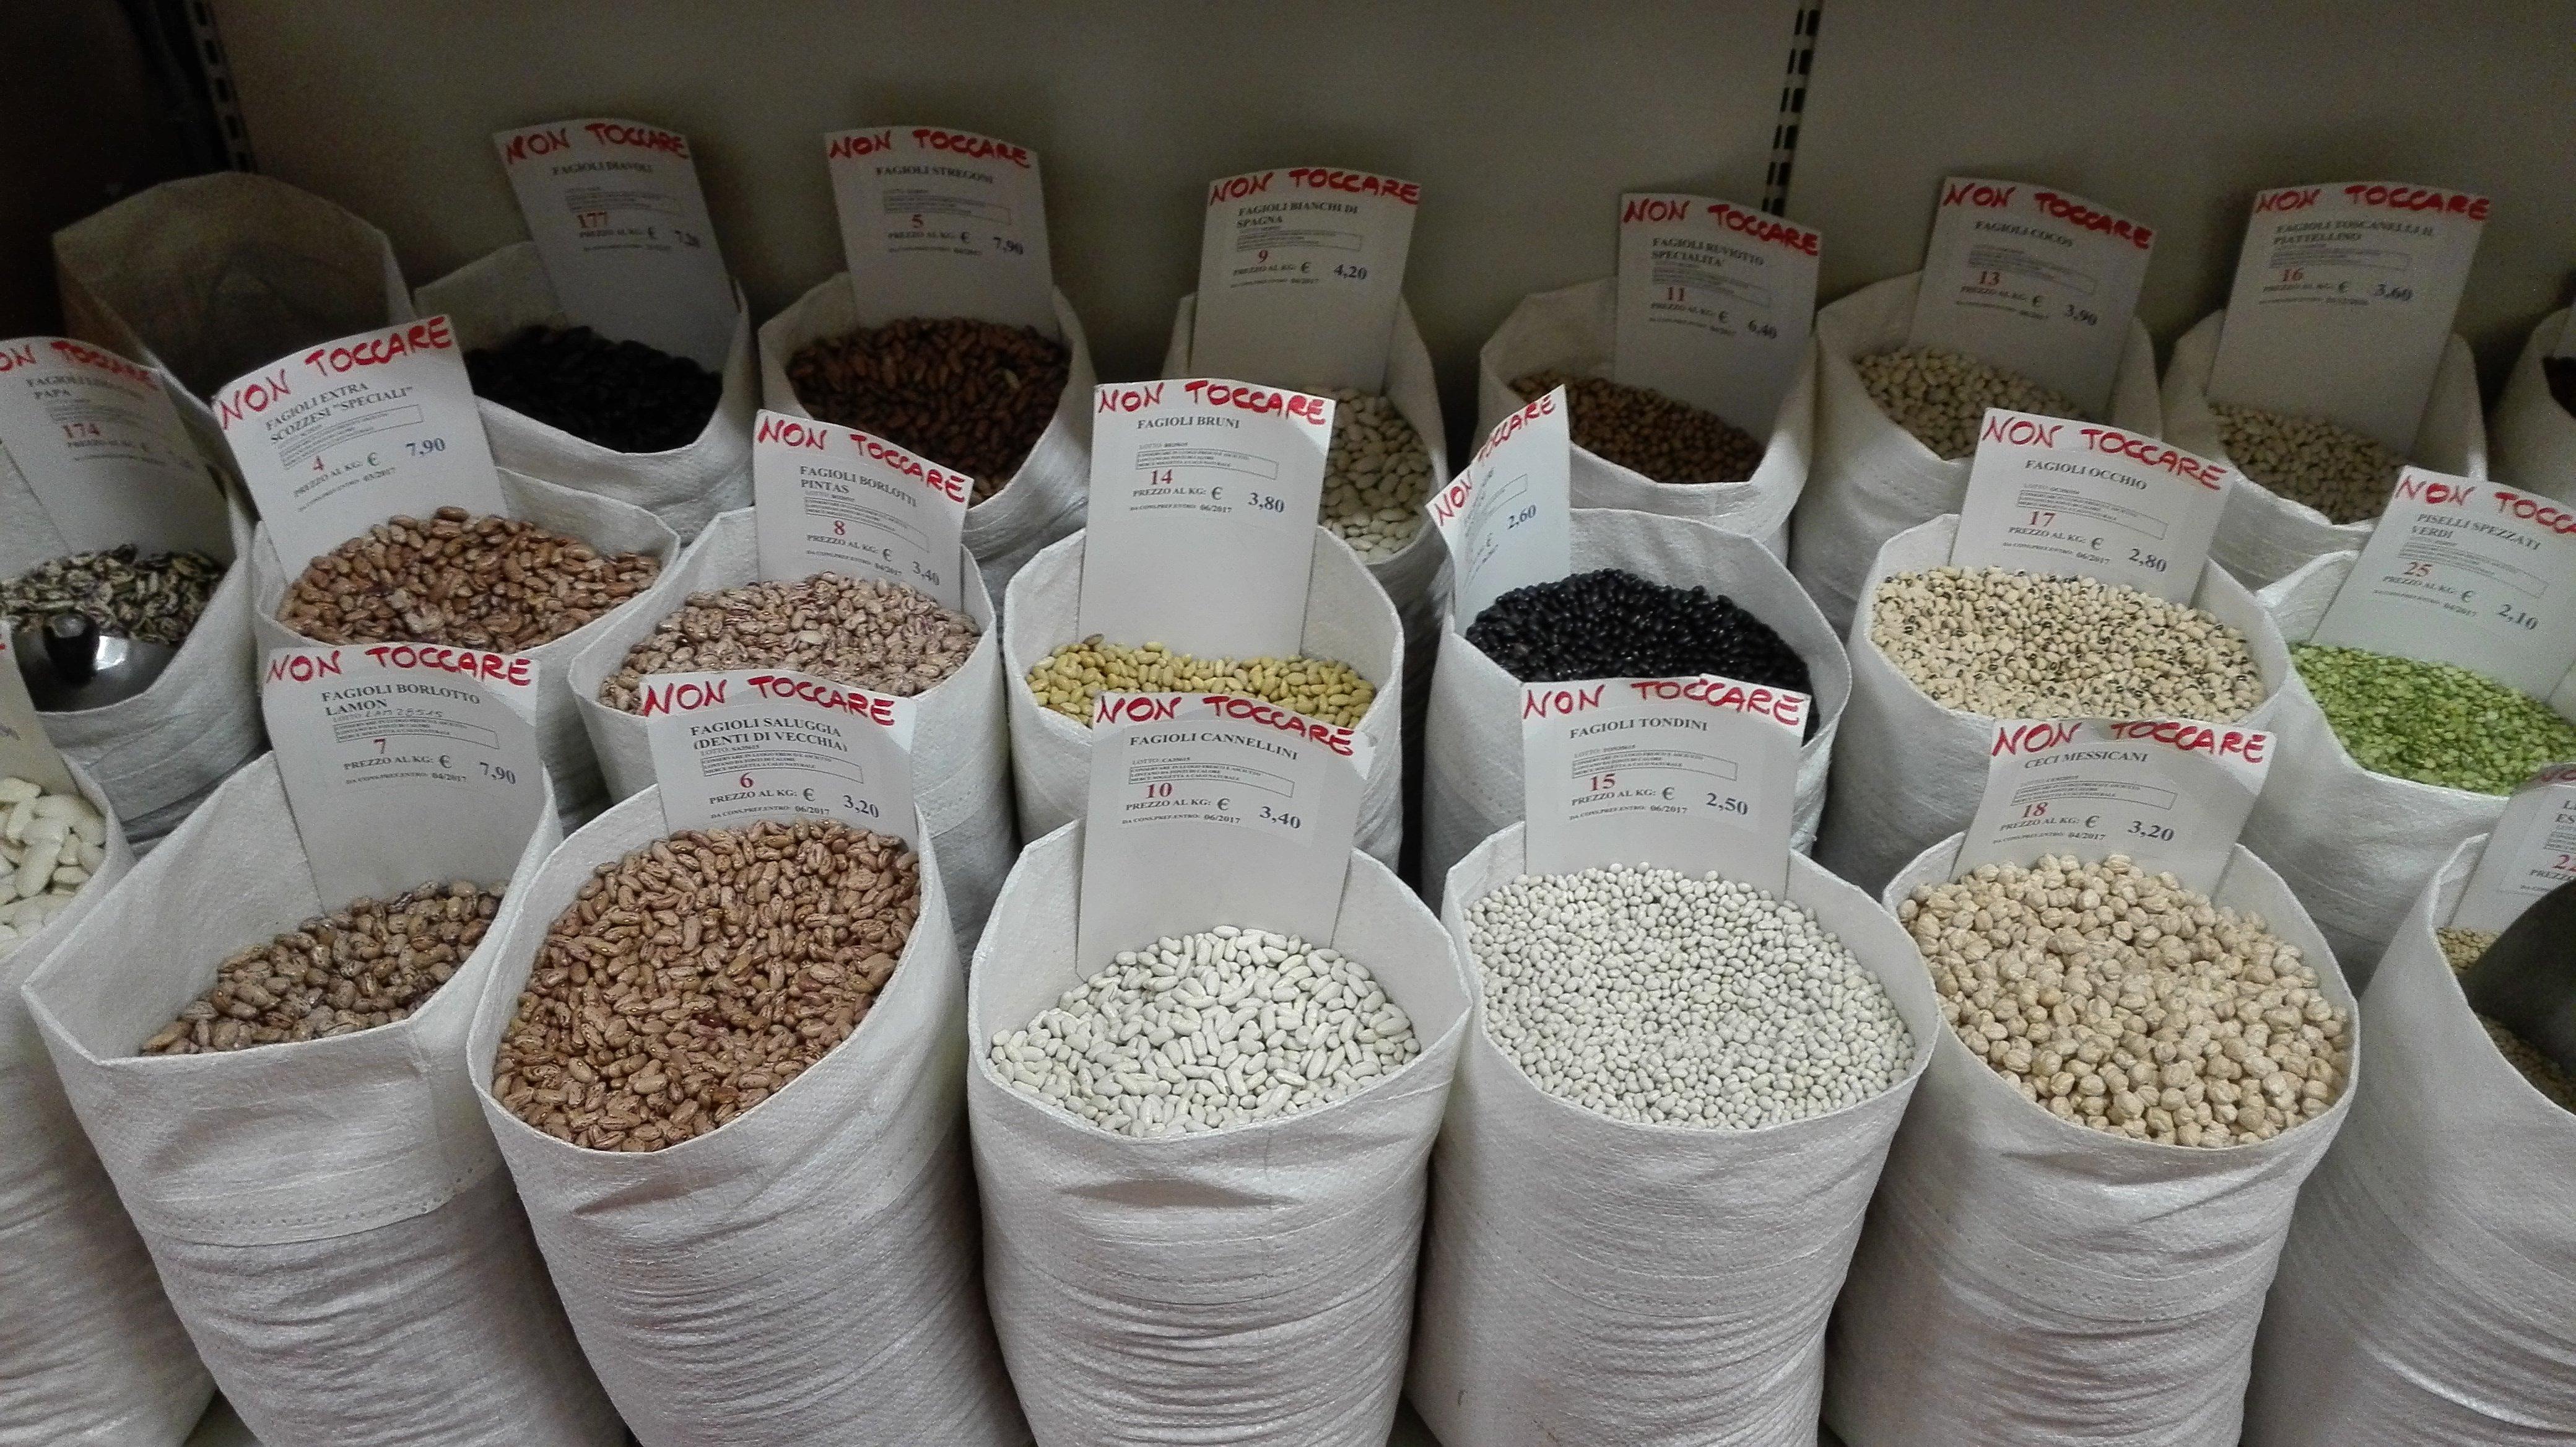 farine alimentari; frutta e verdura; frutta essiccata;